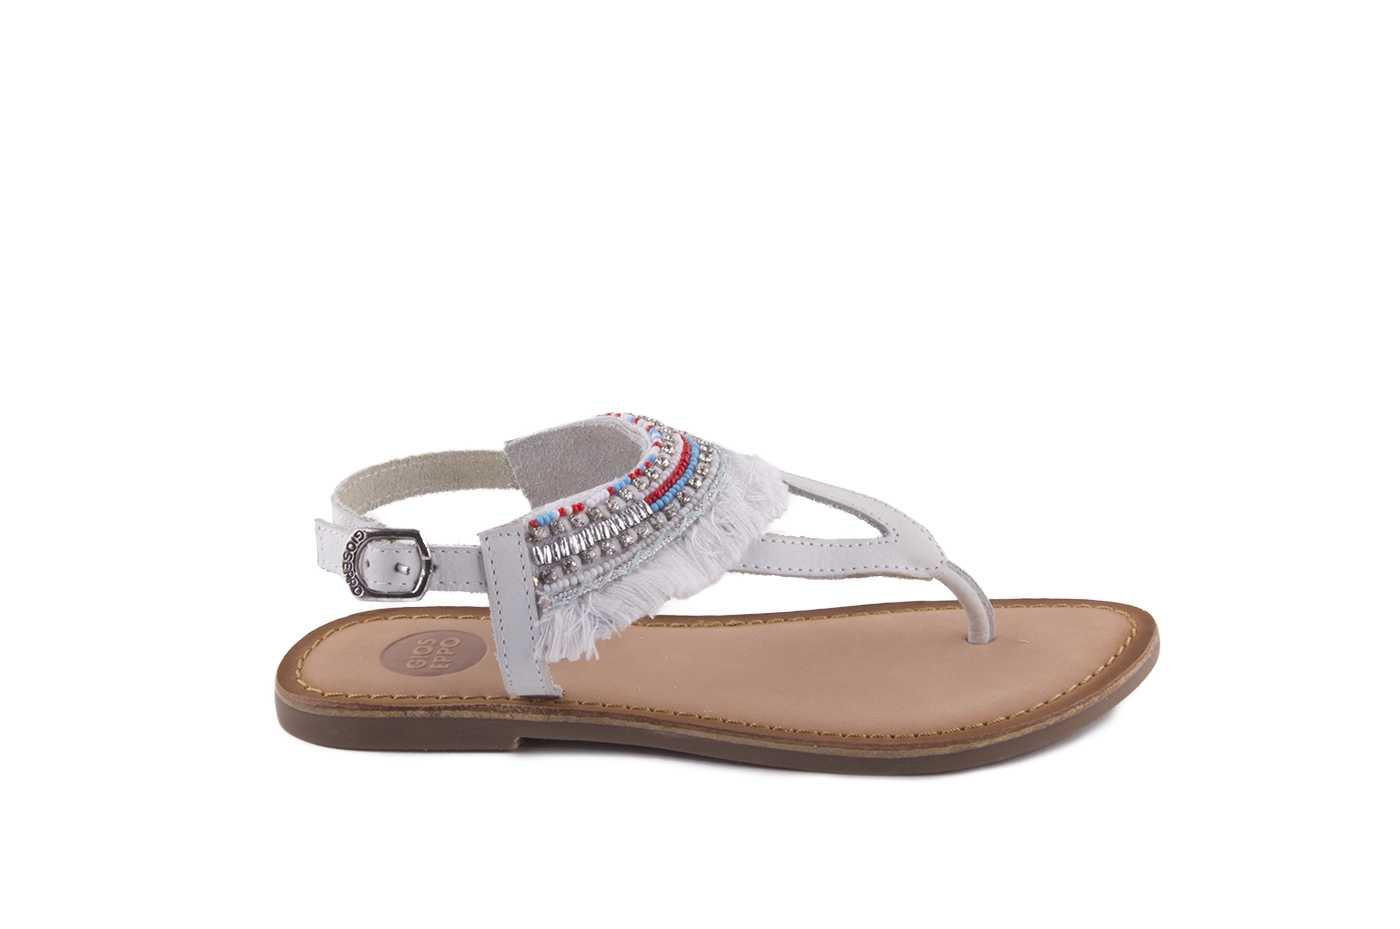 2f012cc06 Comprar zapato tipo JOVEN NIÑA estilo SANDALIA COLOR BLANCO PIEL ...